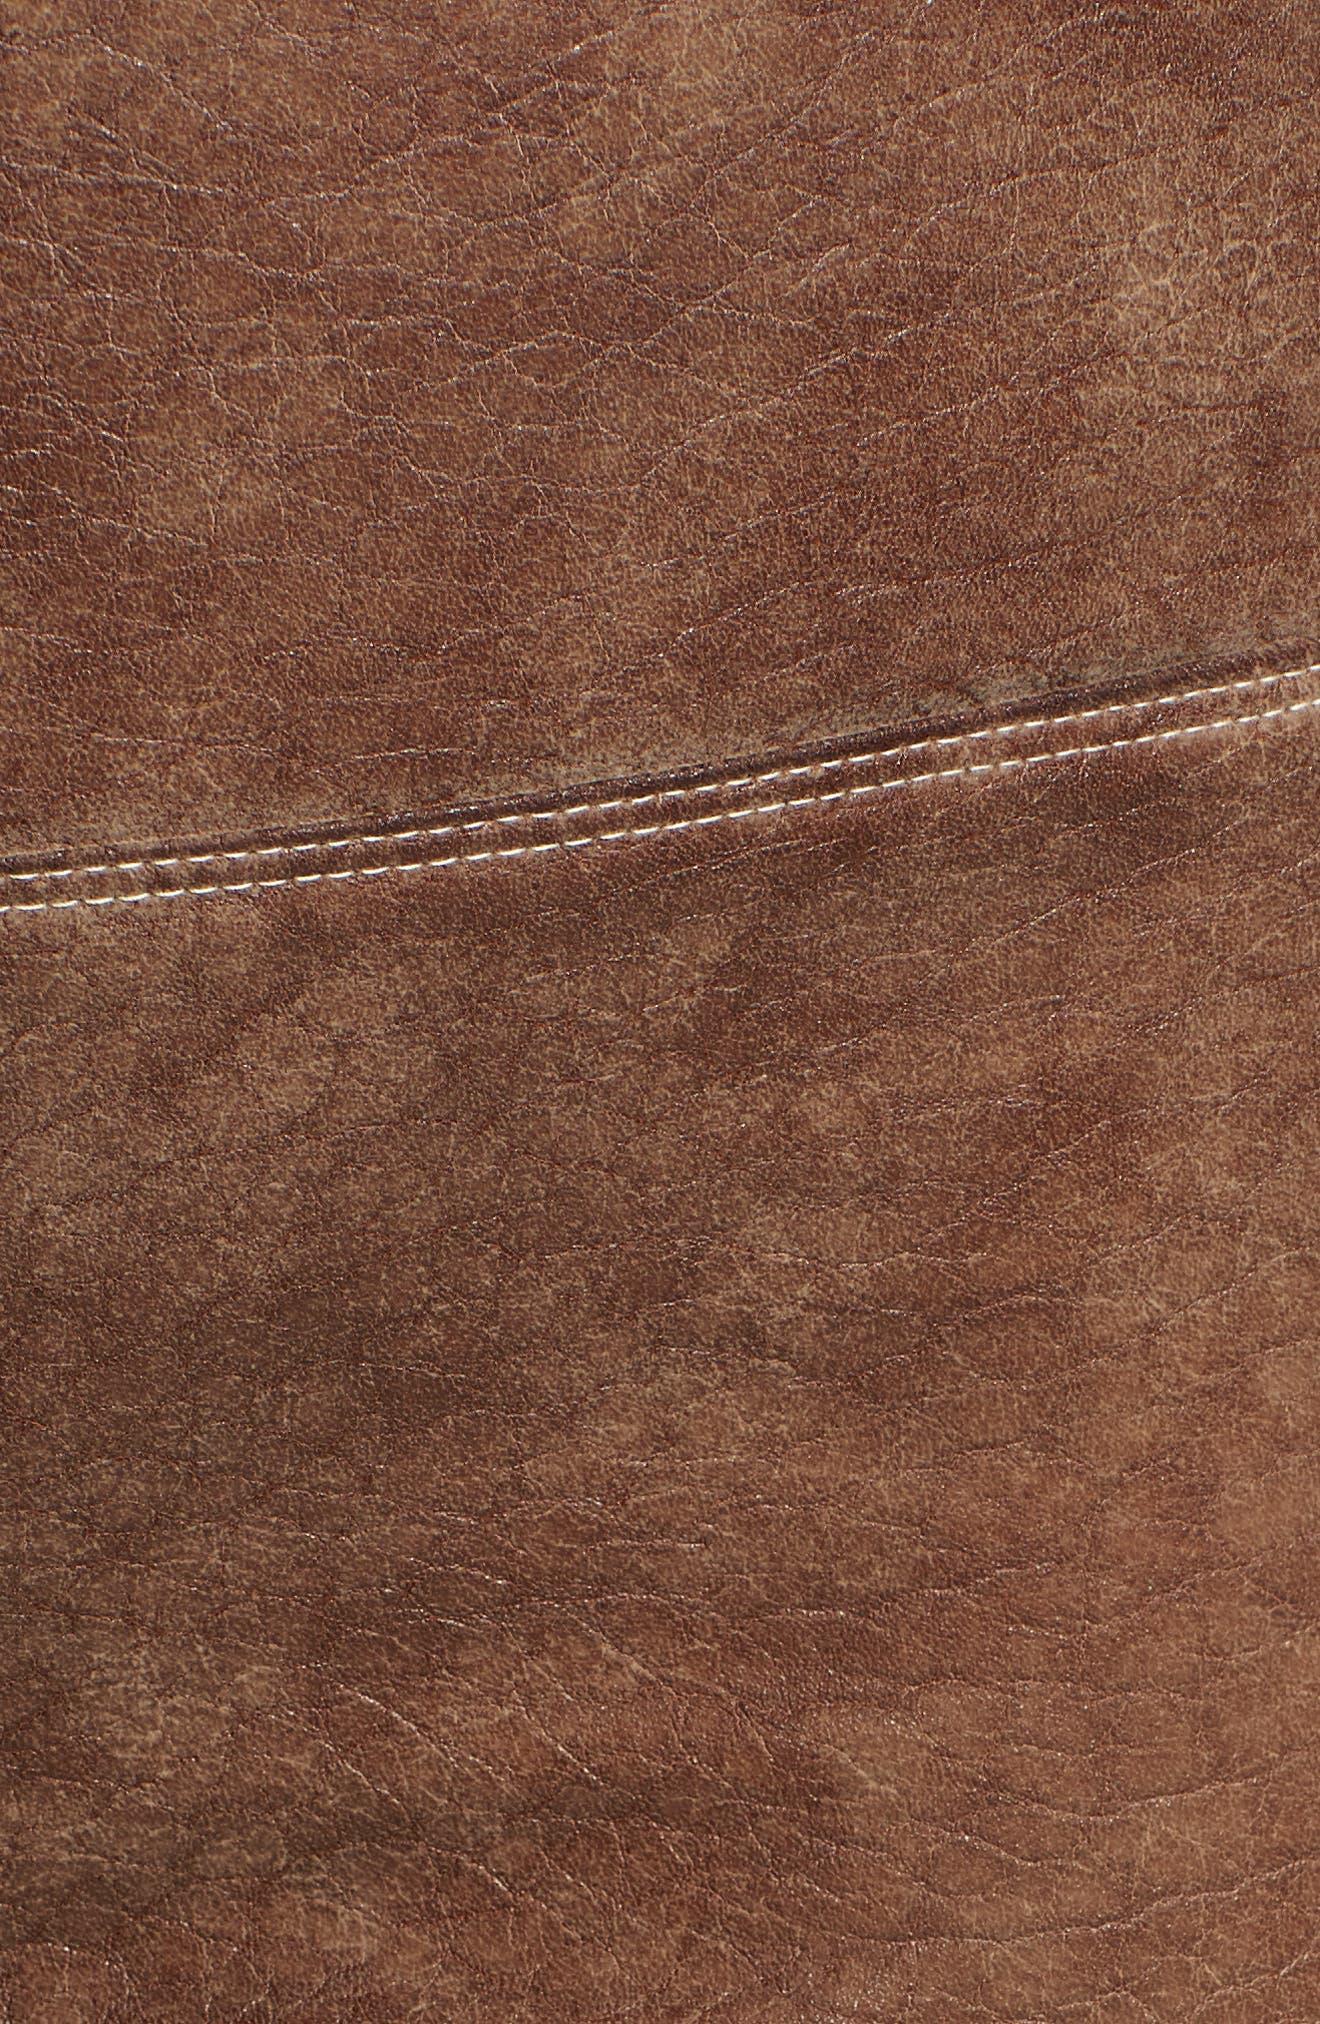 Faux Leather Leggings,                             Alternate thumbnail 6, color,                             SADDLE